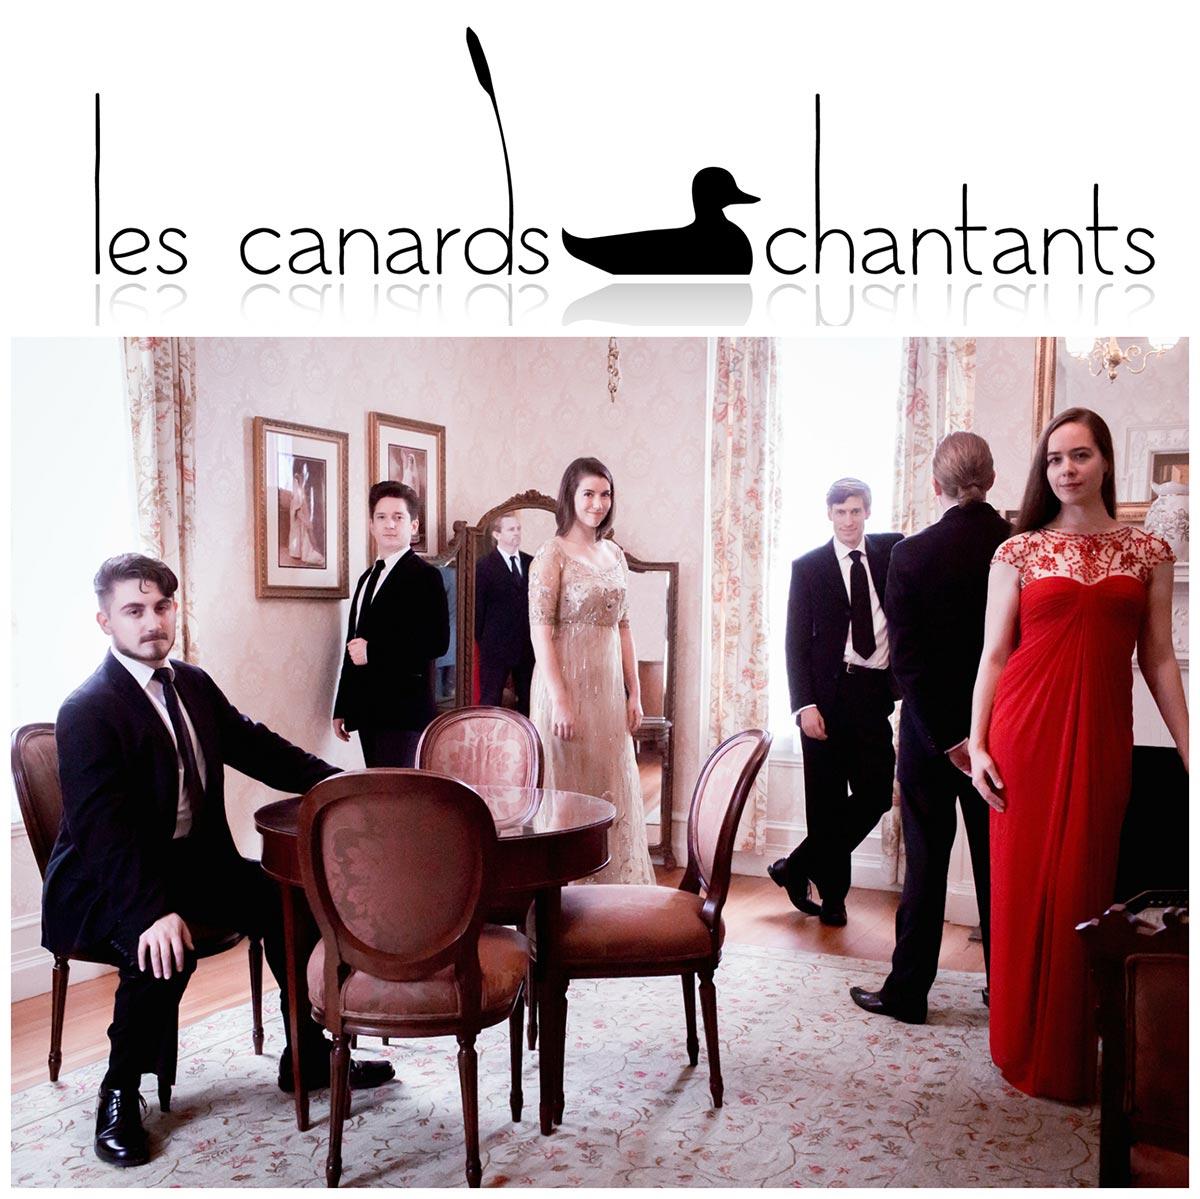 LES CANARDS CHANTANTS